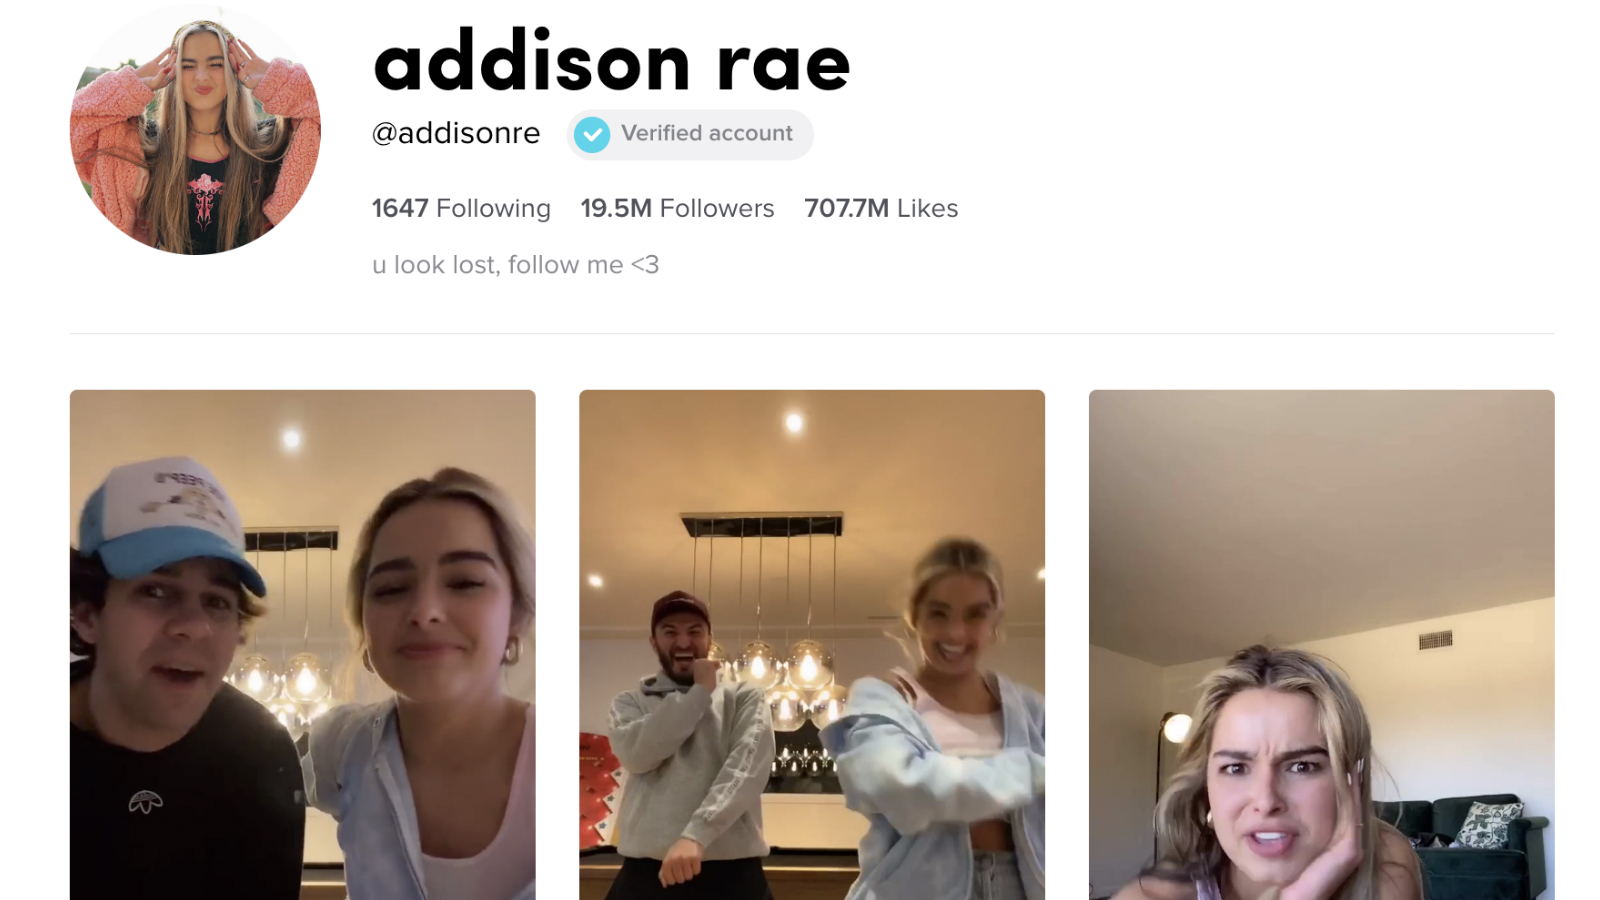 Addison Rae TikTok profile